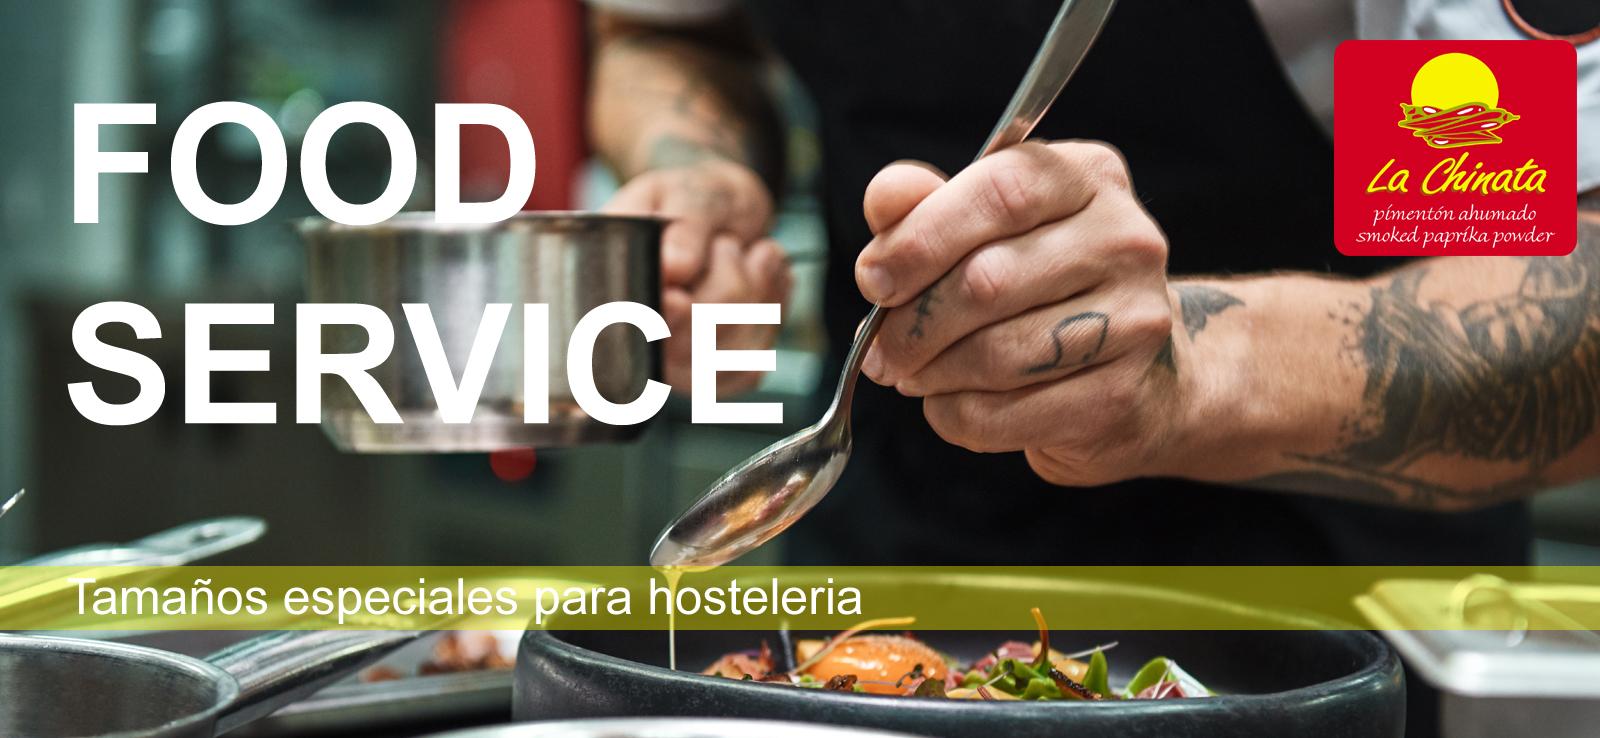 Food Service.